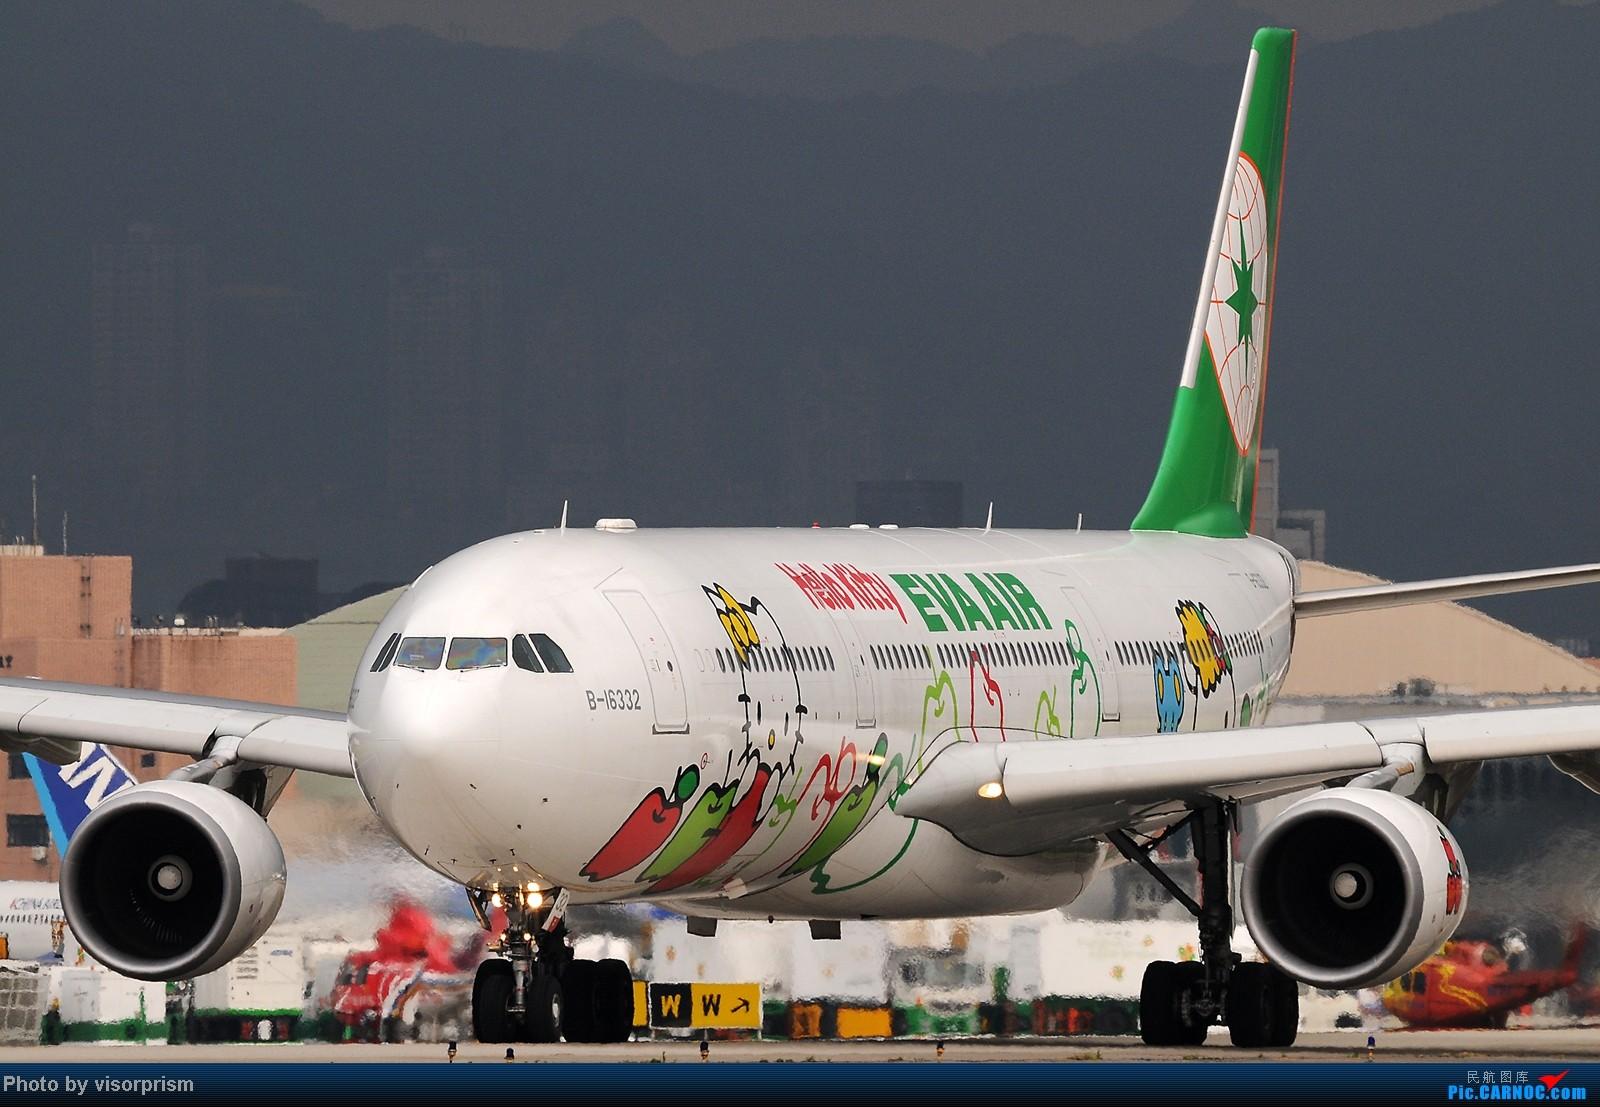 Re:[原创][台北飛友會]SIGMA APO 500mm F4.5 DG HSM 鏡頭測試 AIRBUS A330-300 B-16332 中国台北松山机场